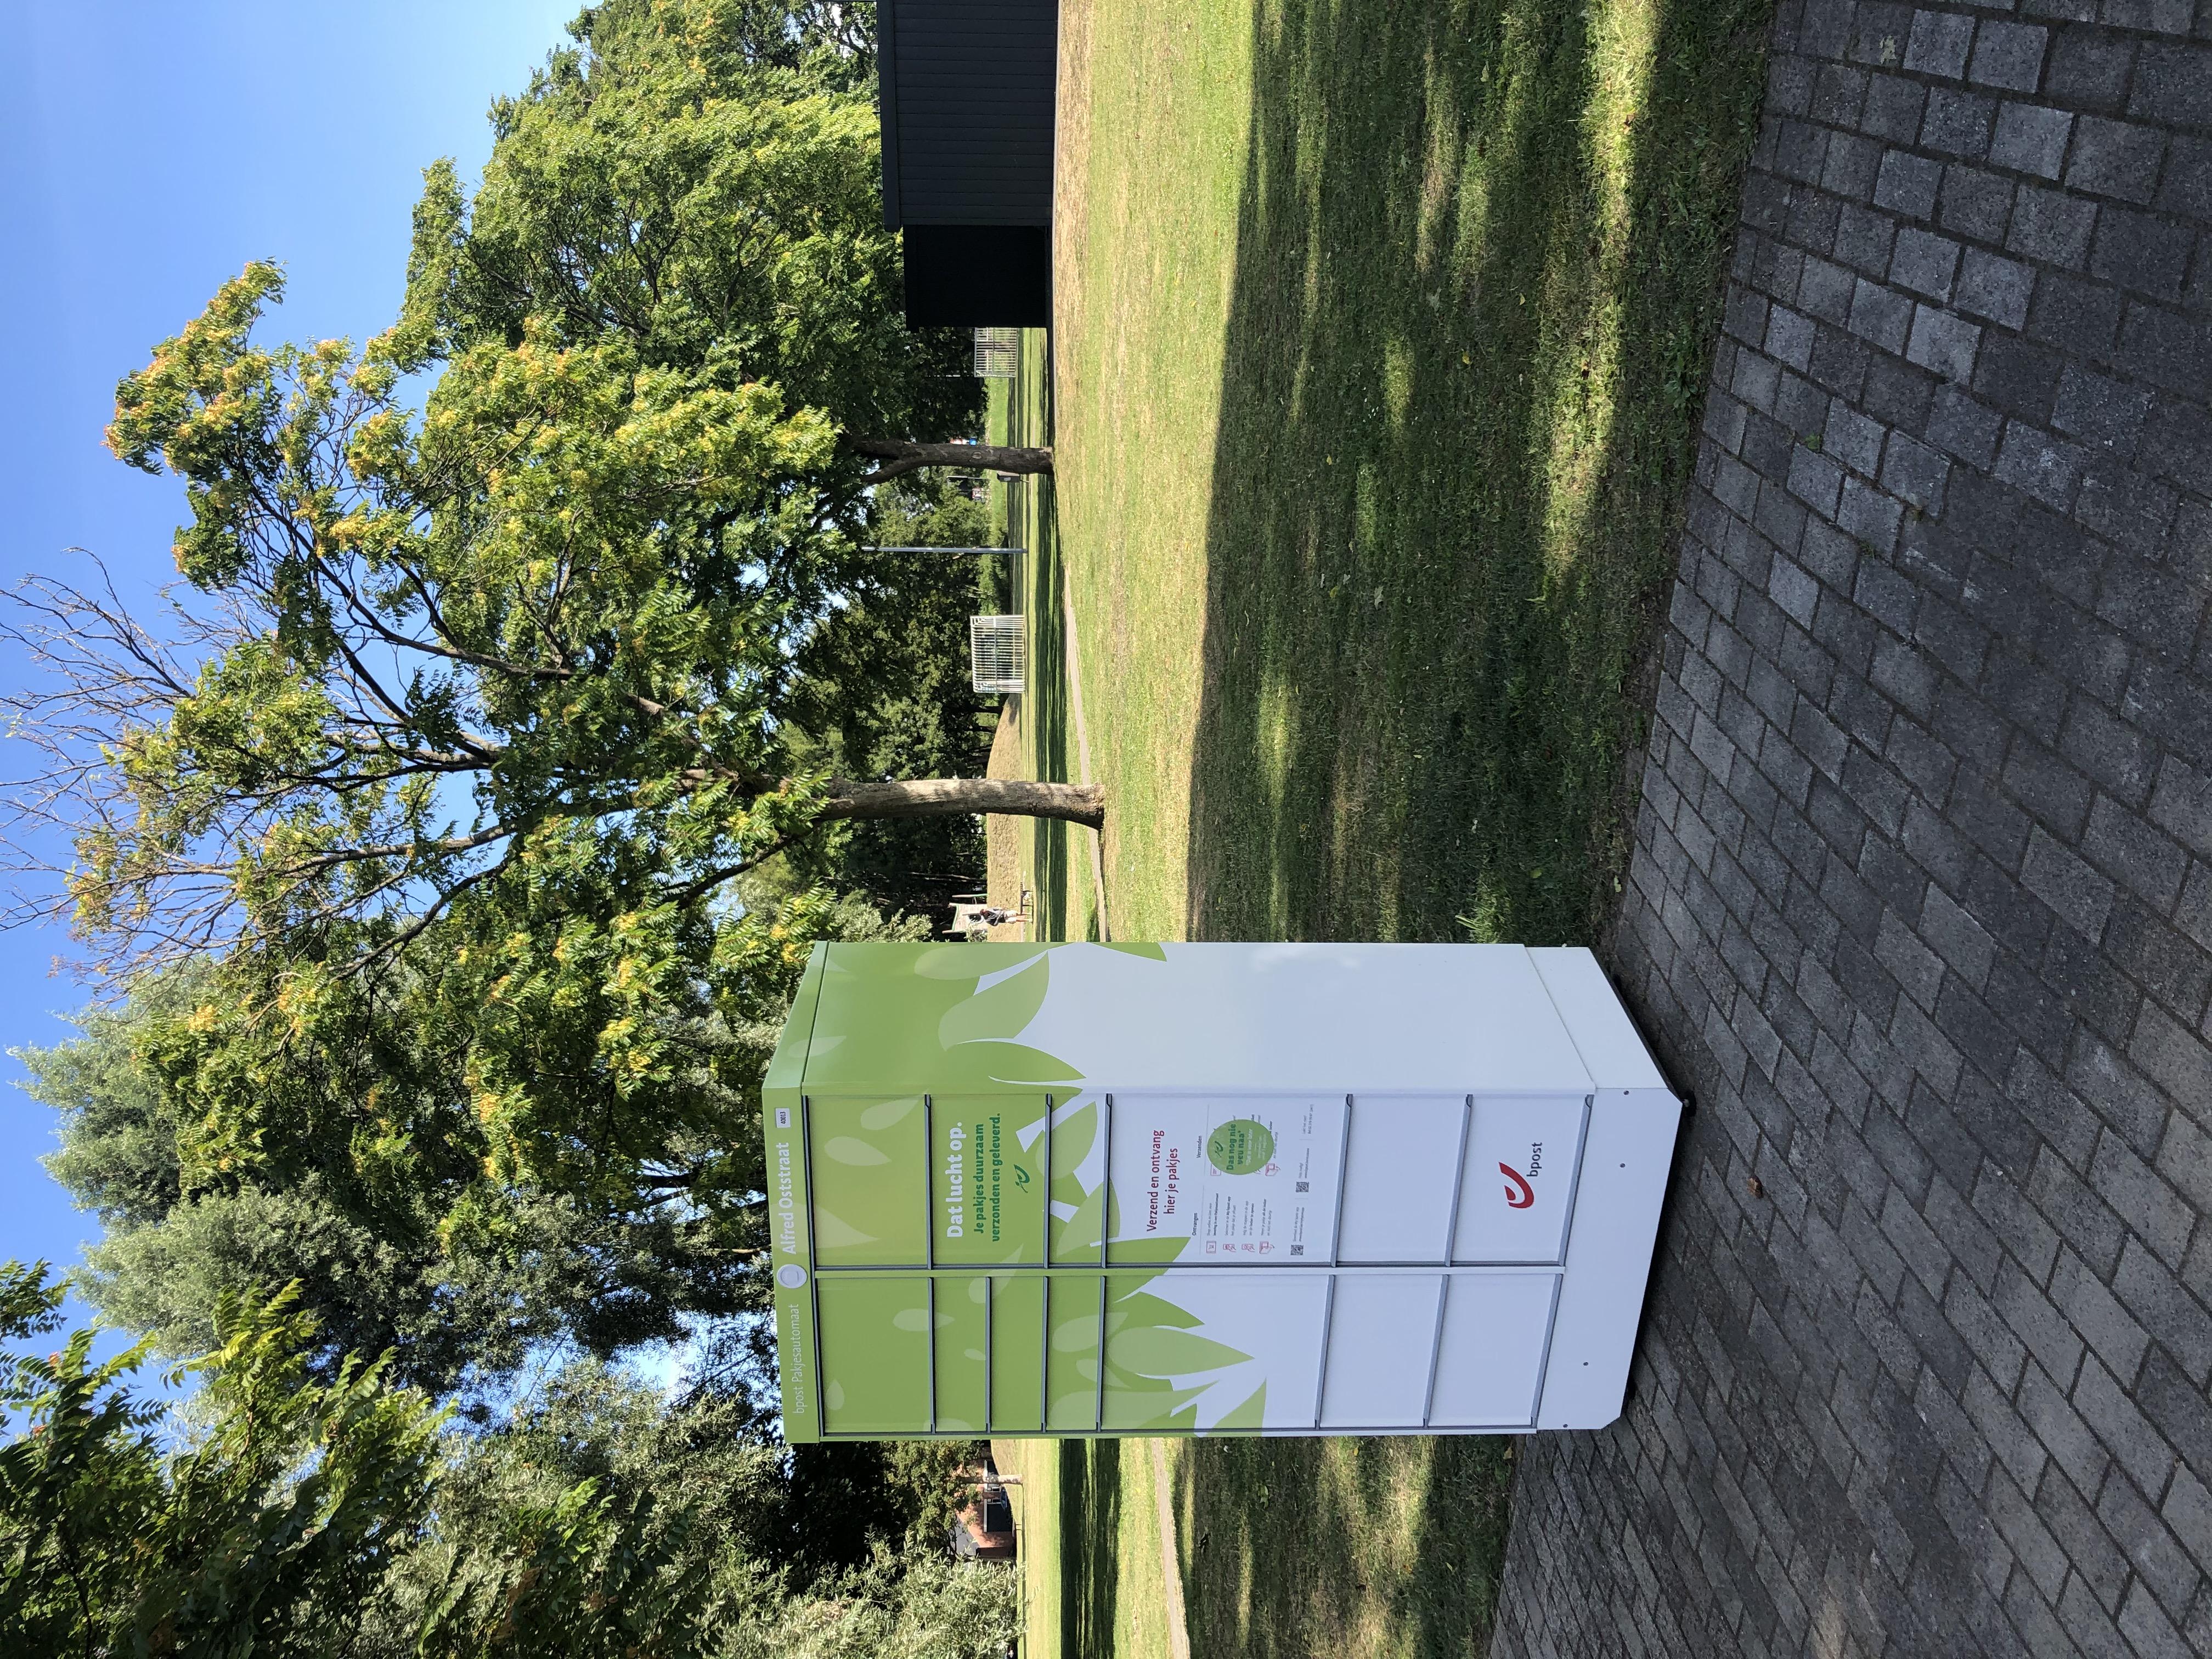 XL Reklame Mechelen - belettering pakjesautomaat